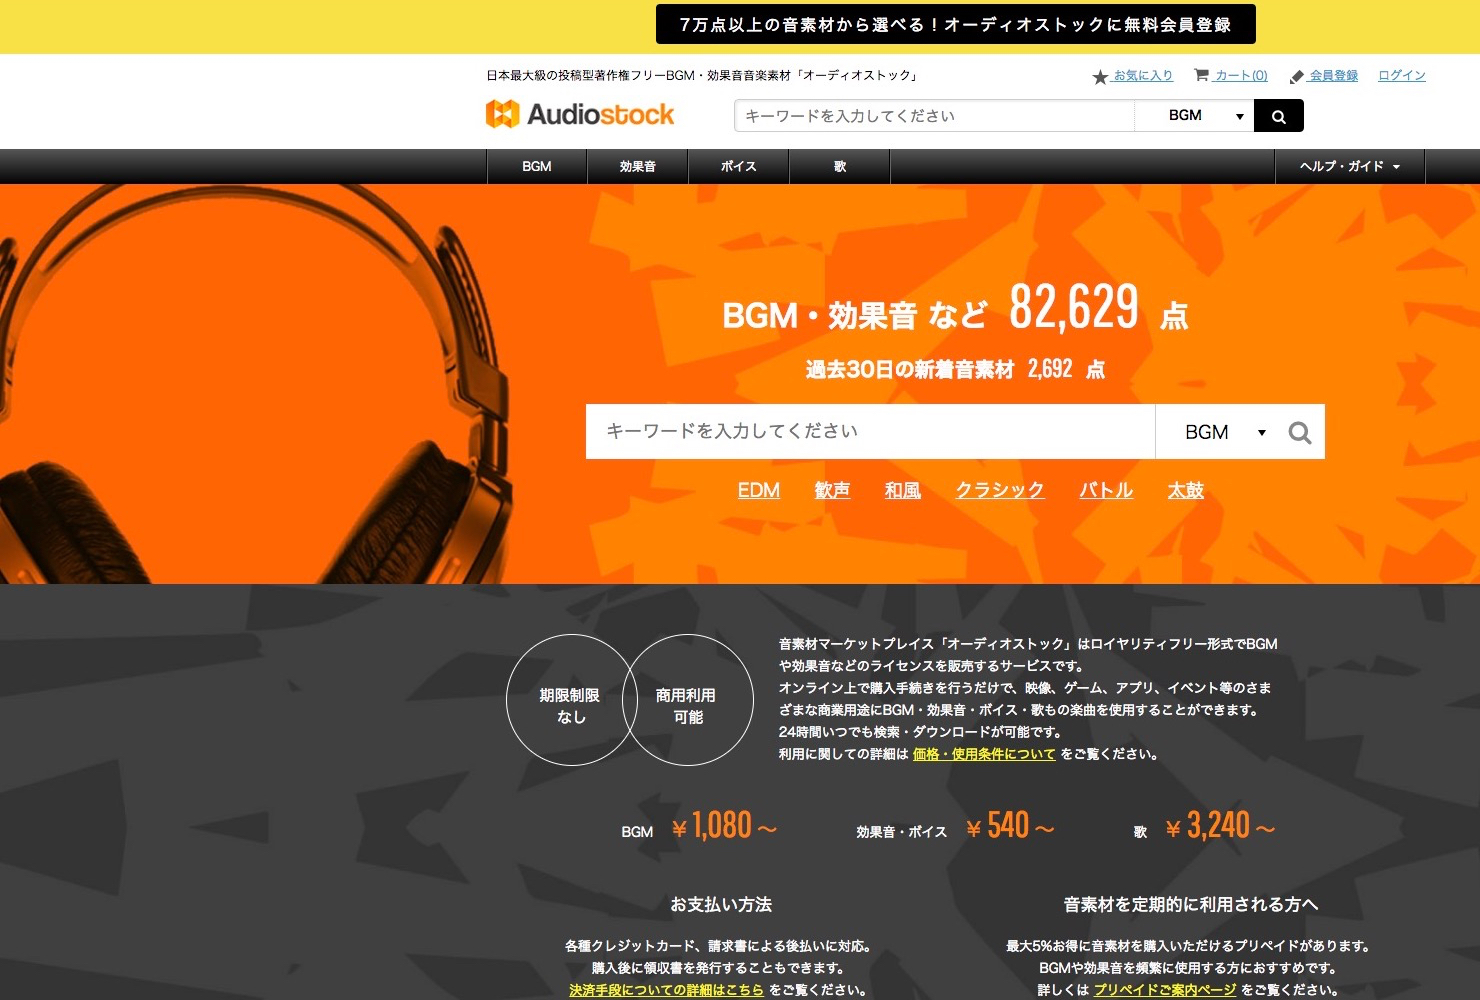 AudioStock_website